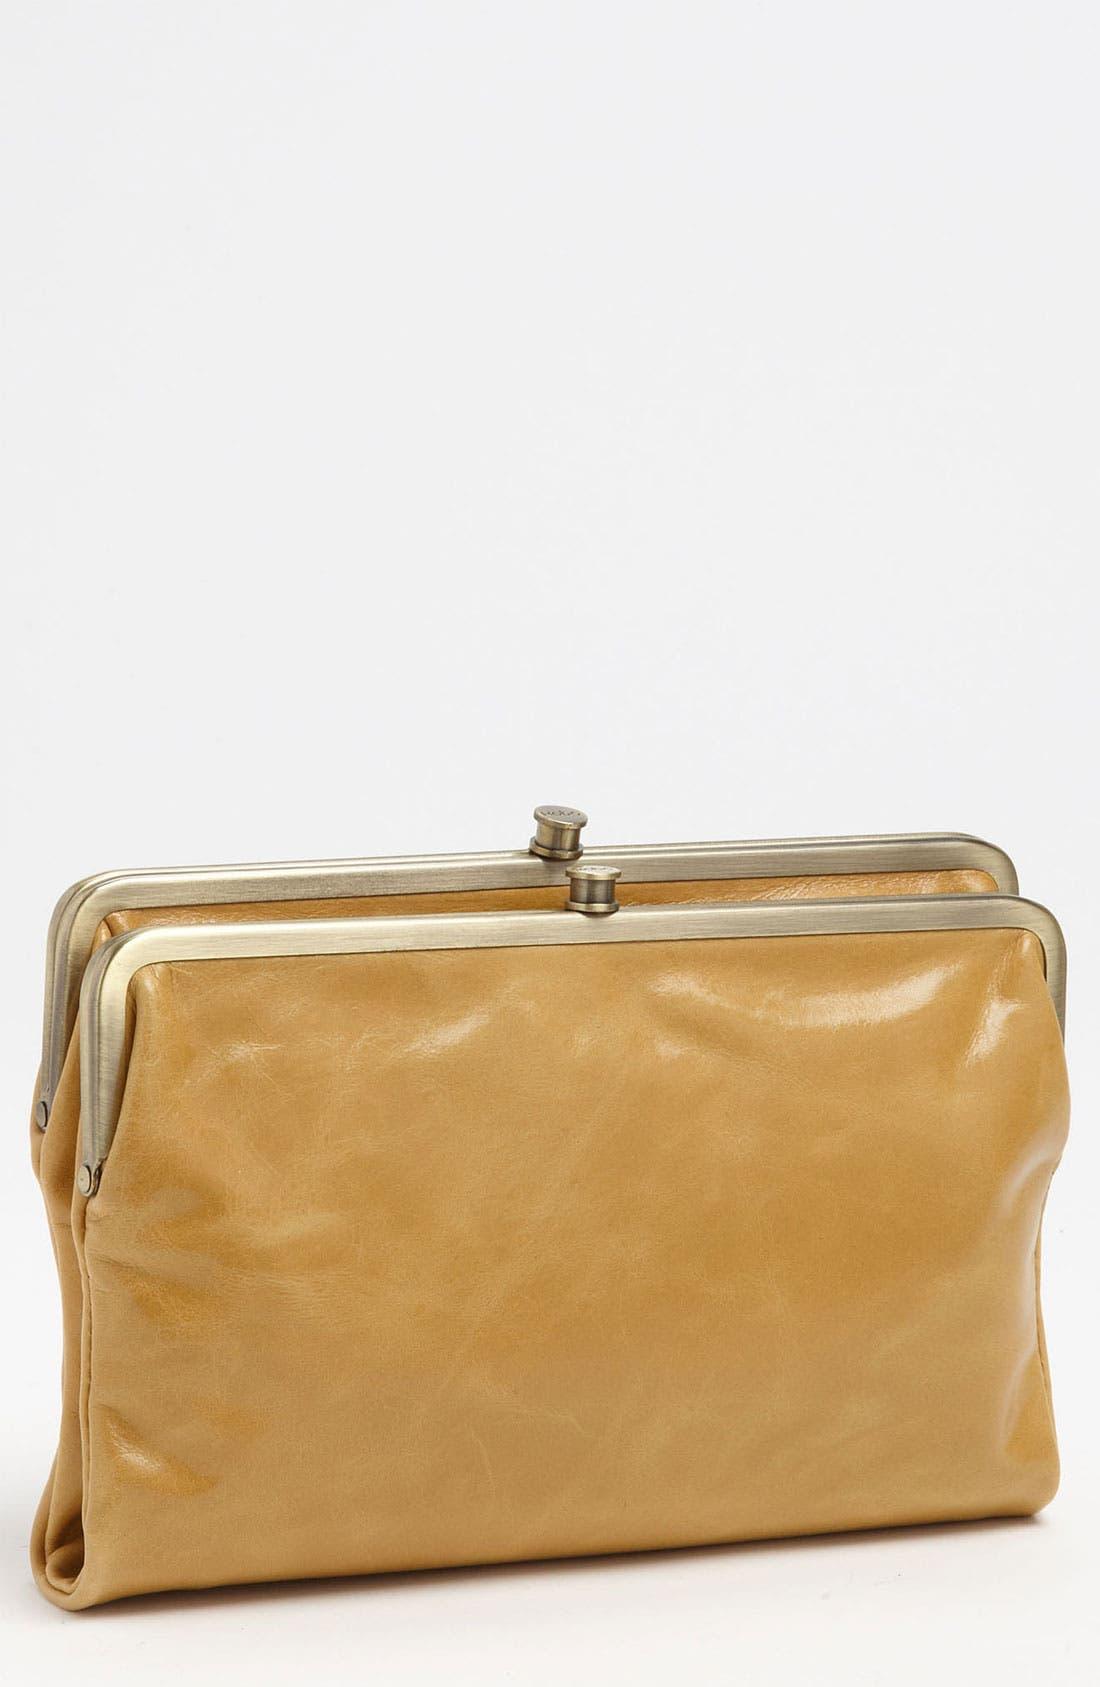 Alternate Image 1 Selected - Hobo 'Vintage Leanne' Leather Crossbody Bag